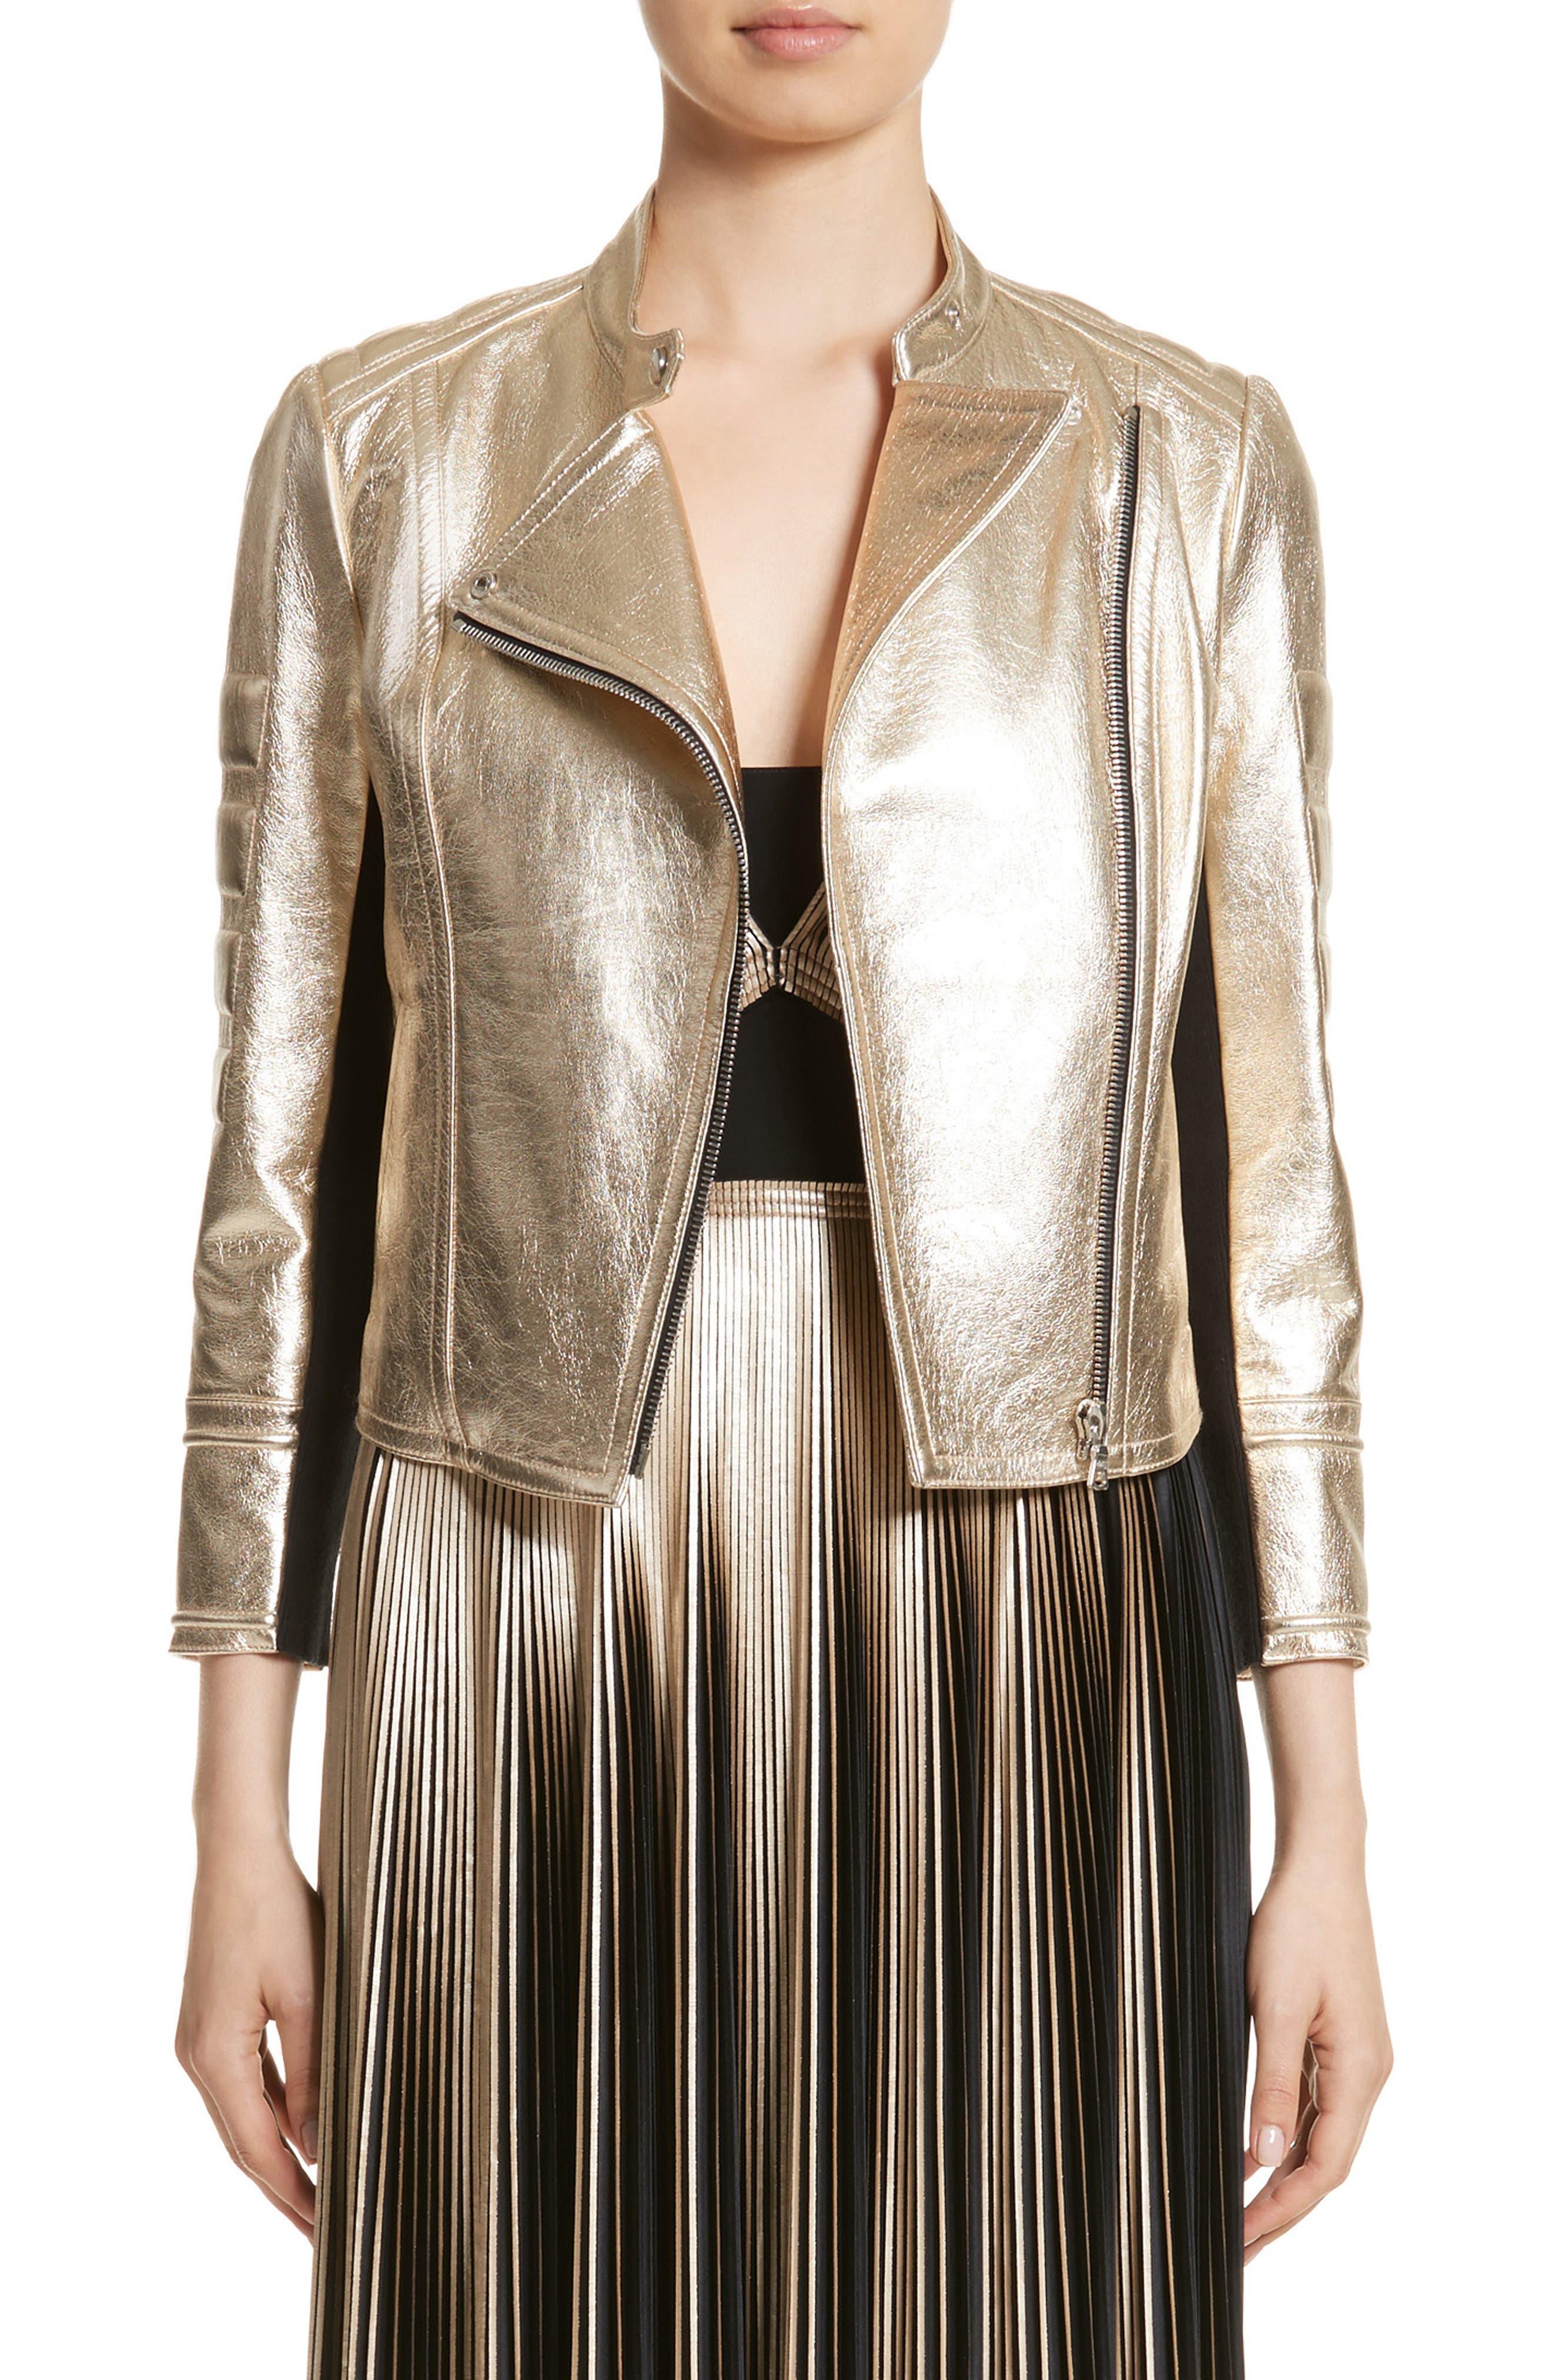 Alternate Image 1 Selected - Yigal Azrouël Foiled Metallic Leather Moto Jacket